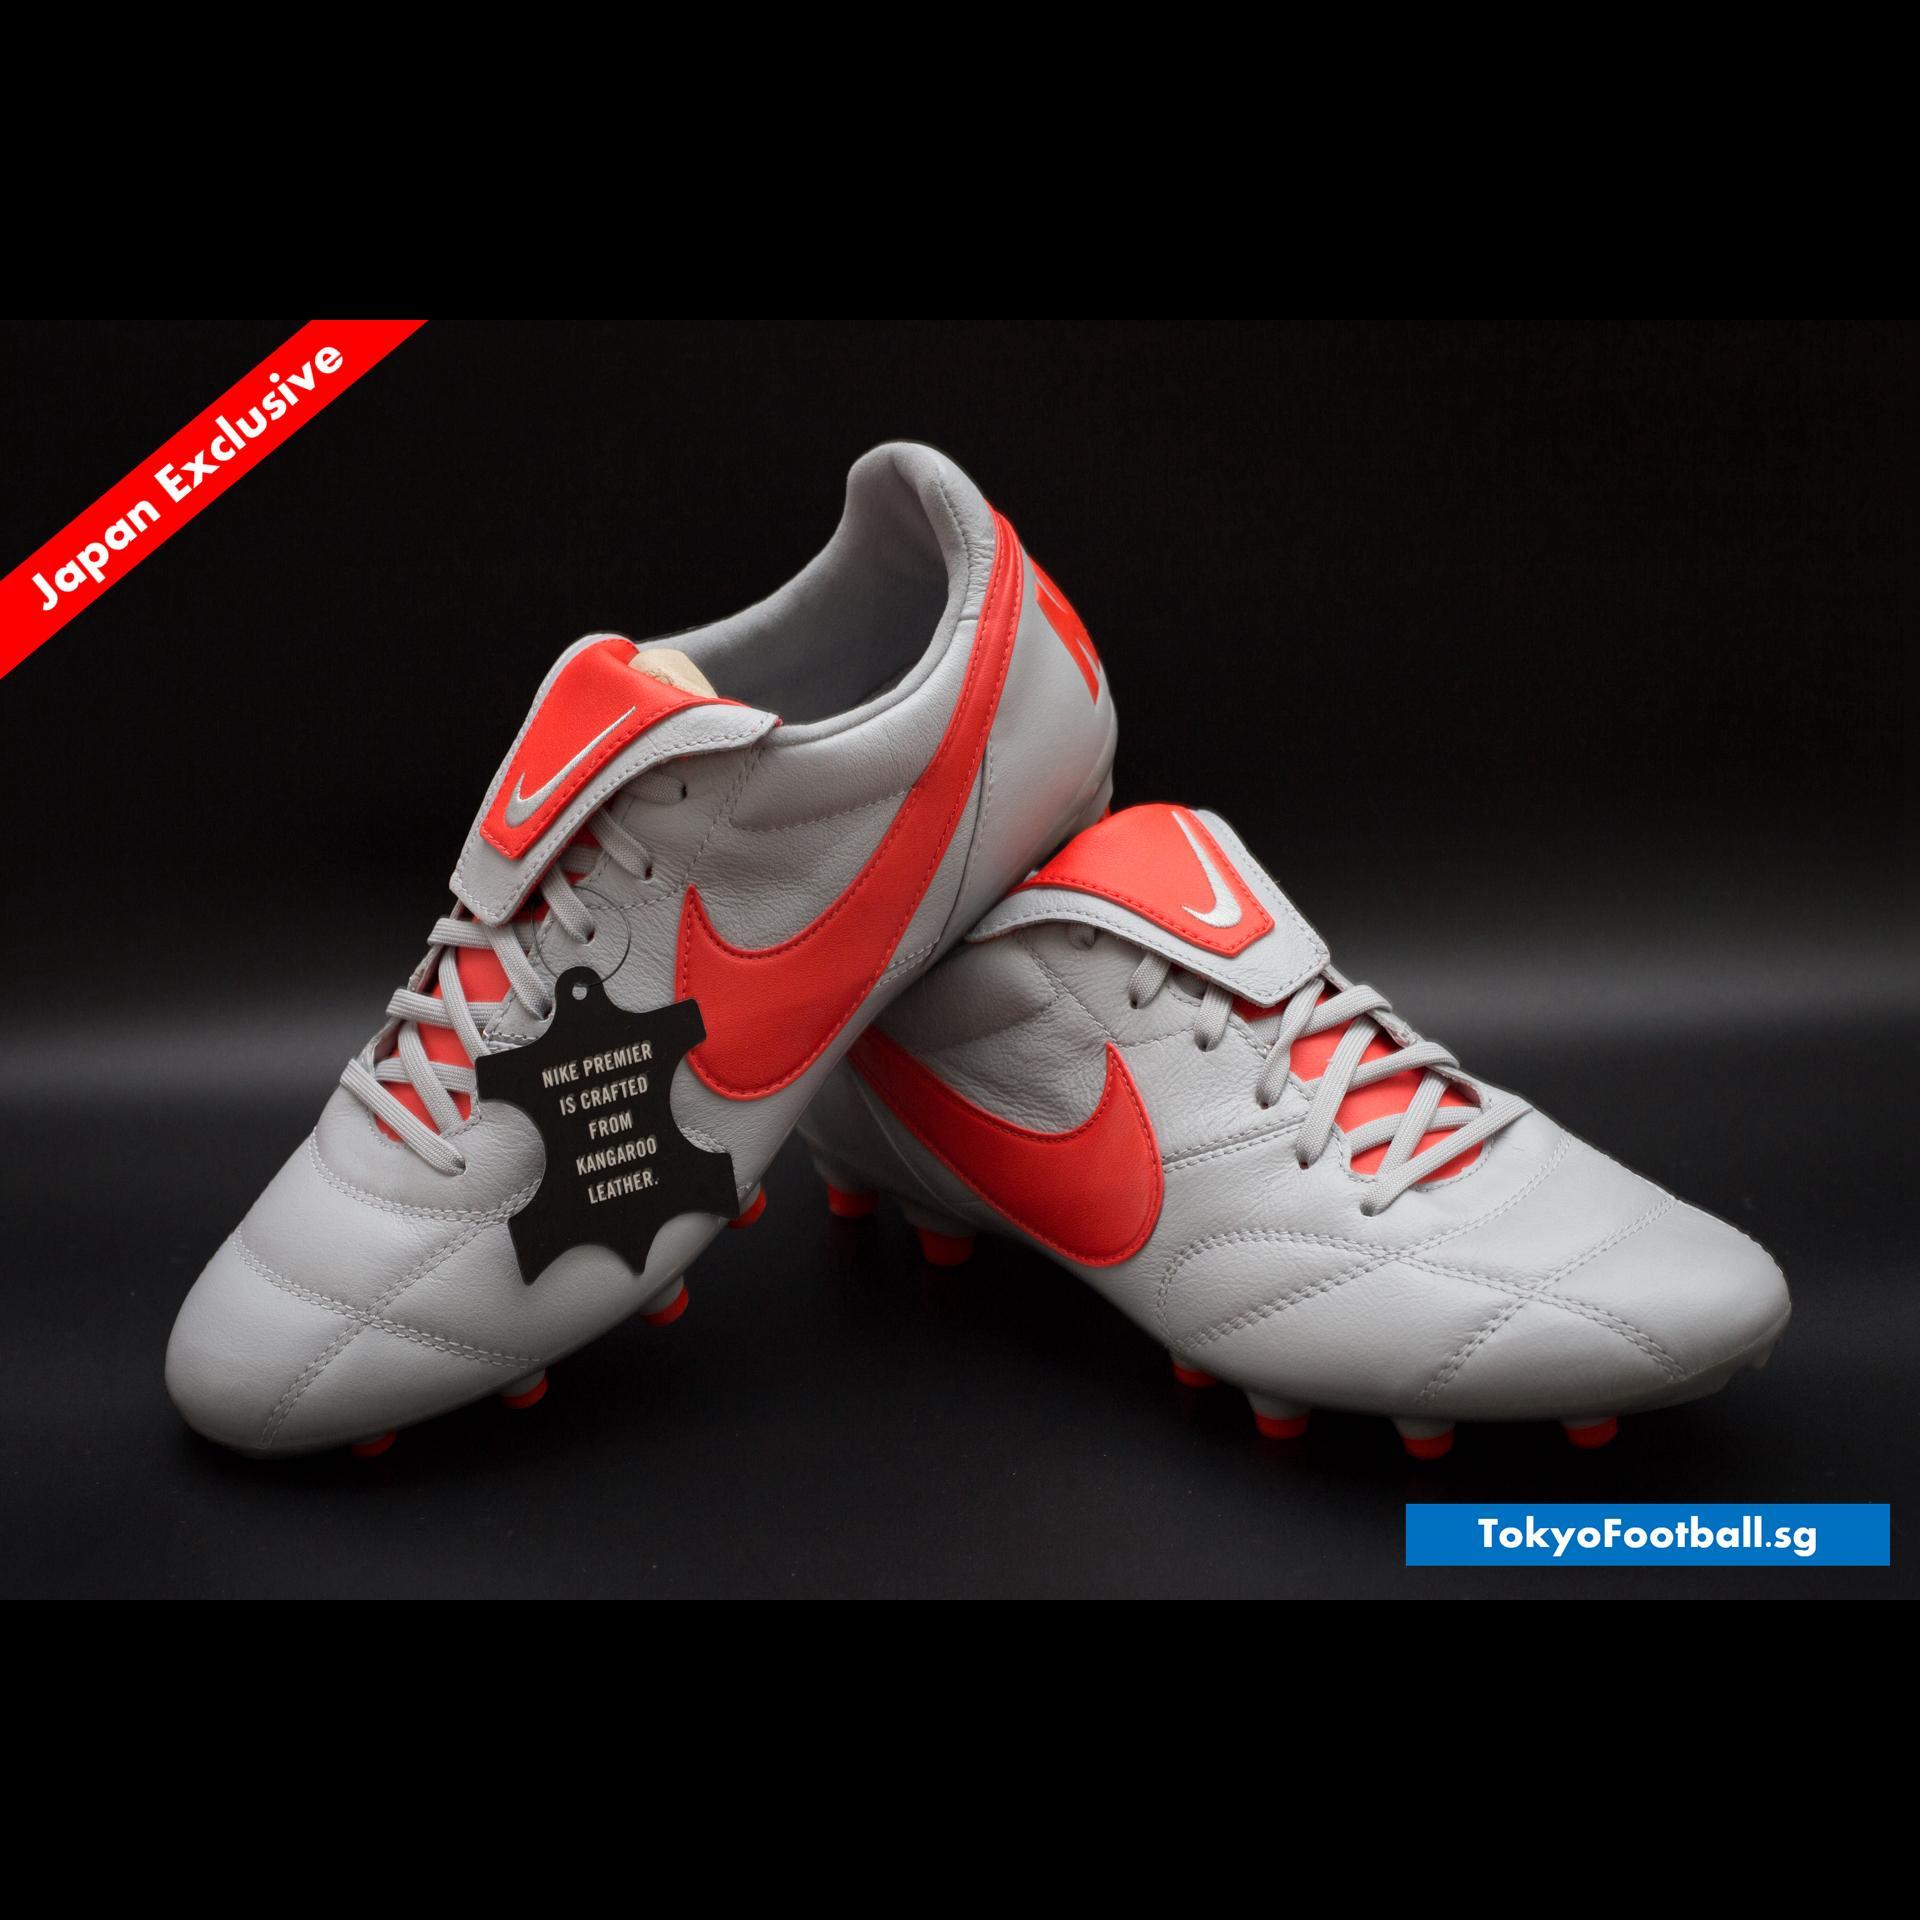 Shoes Buy OnlineLazada Nike Football Buy 2E9HDI